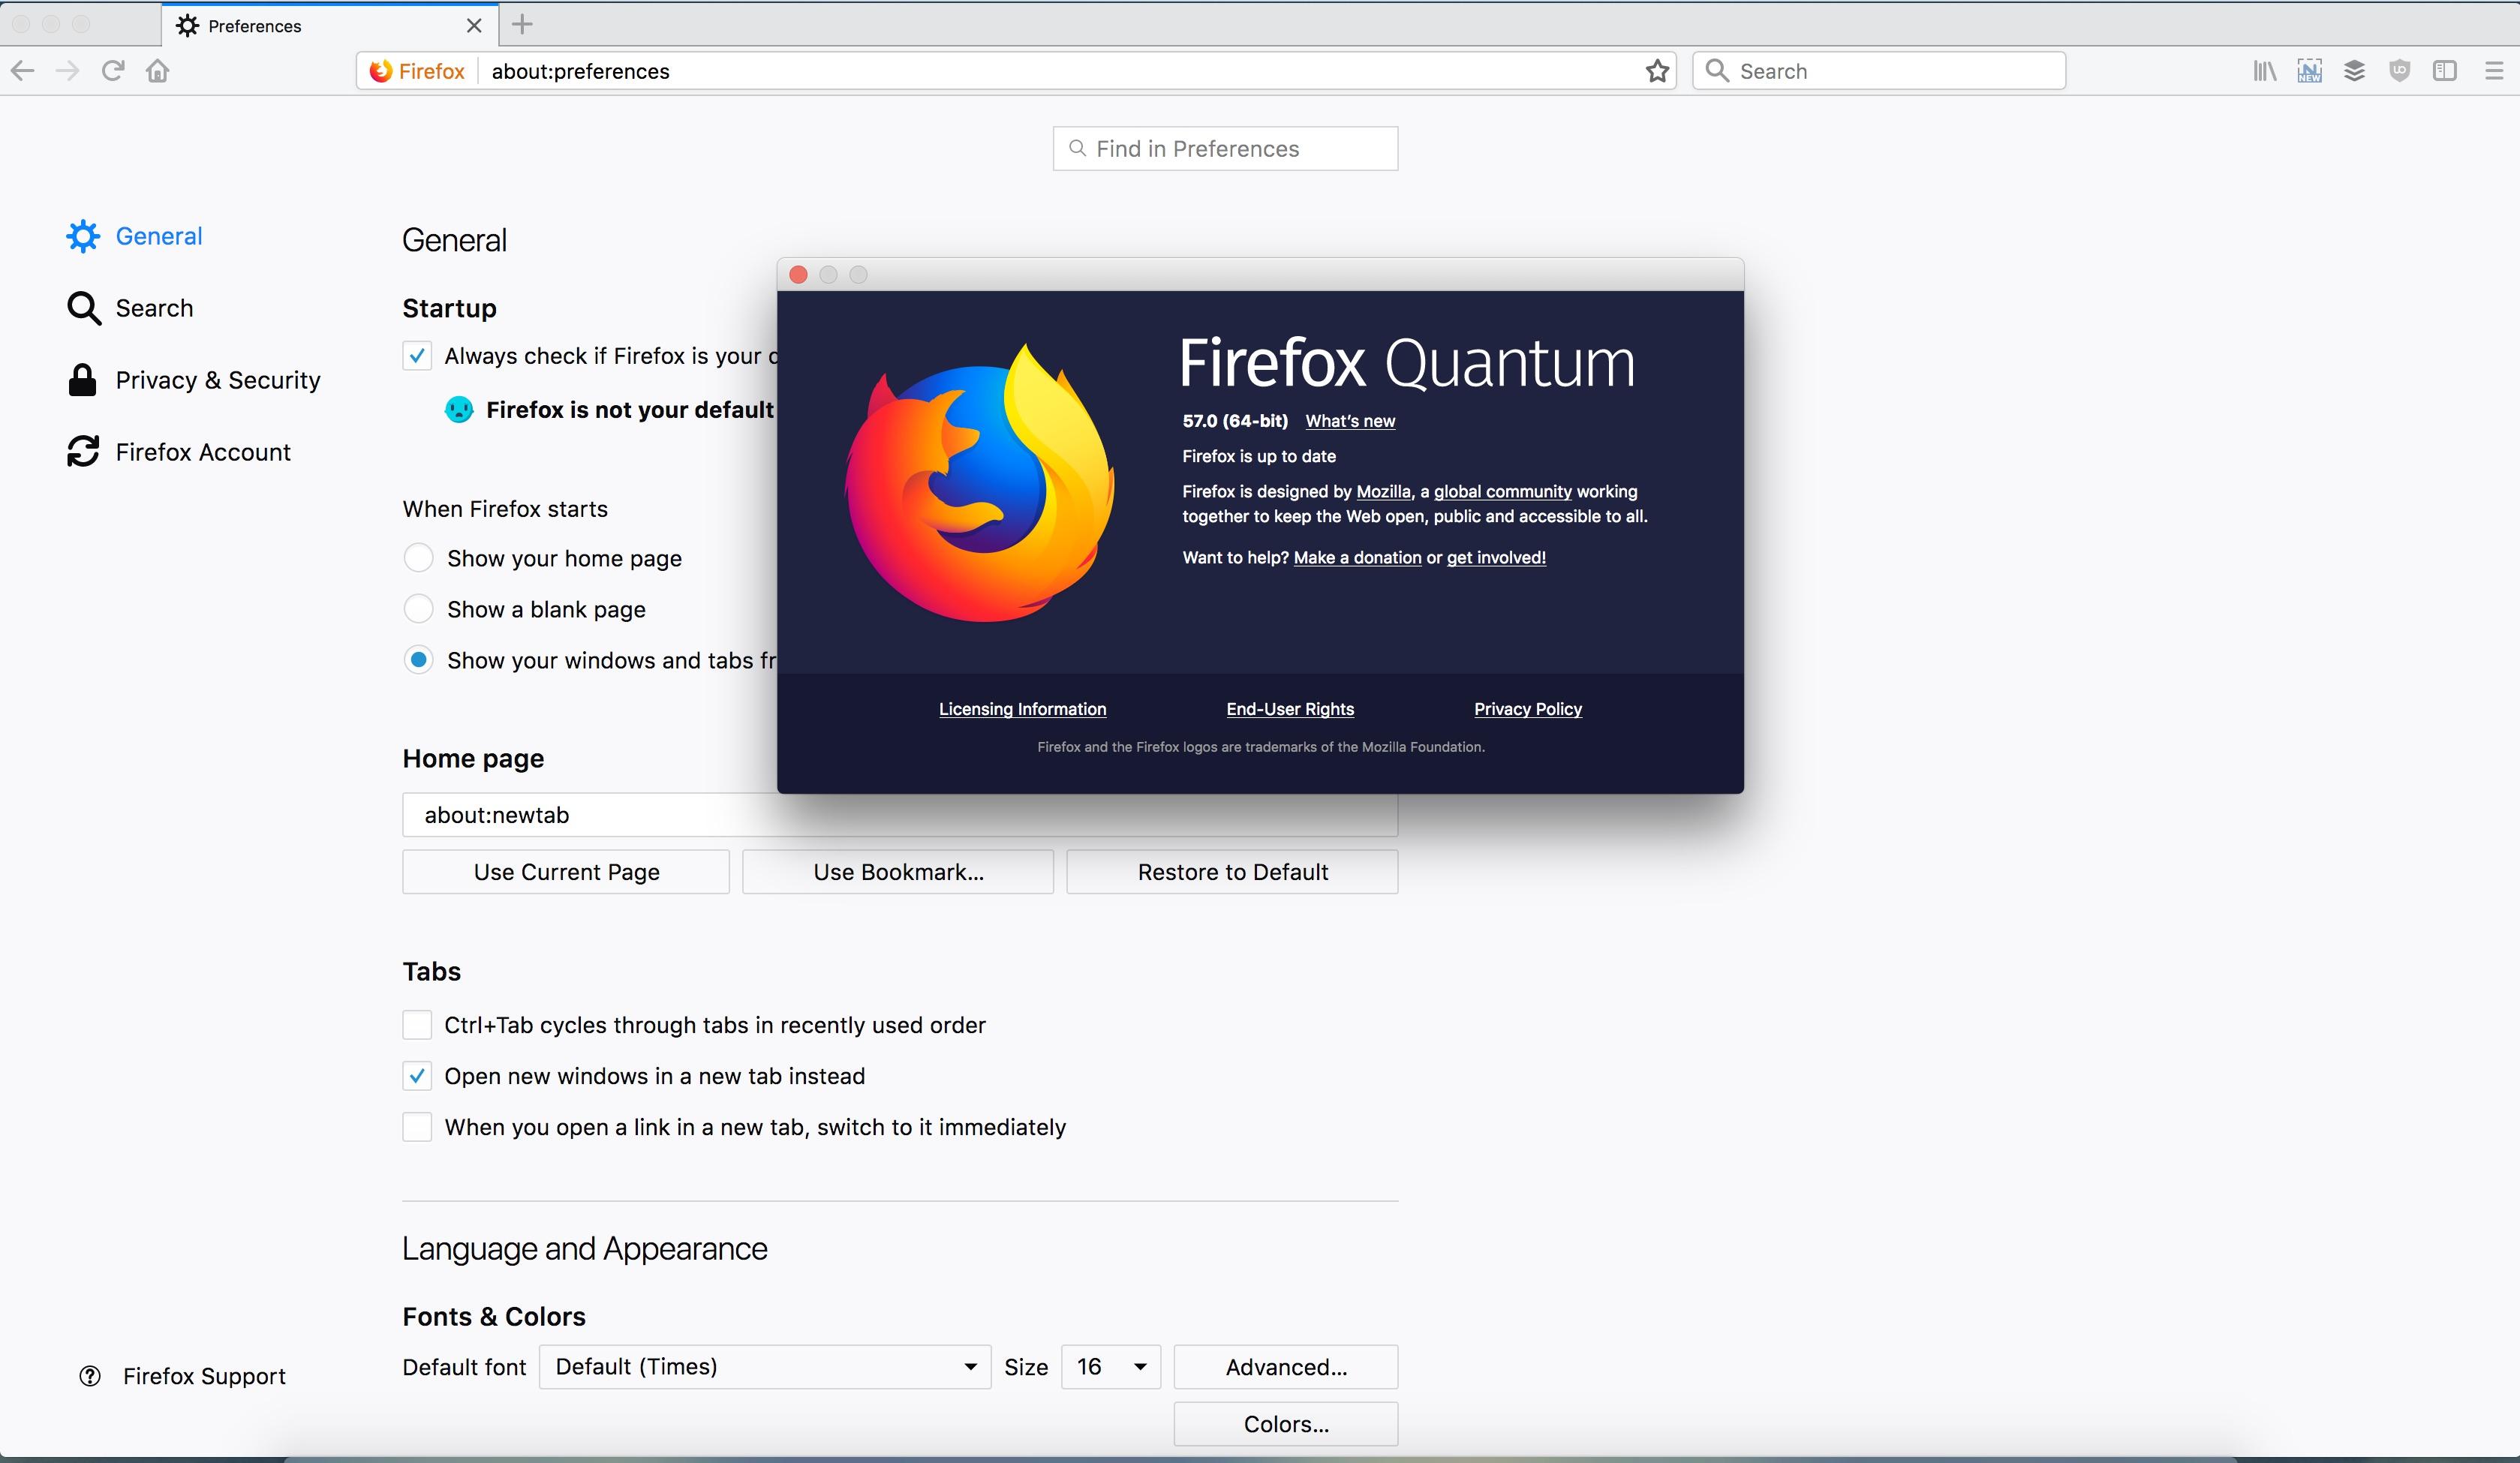 mozilla firefox 64 bit download offline installer